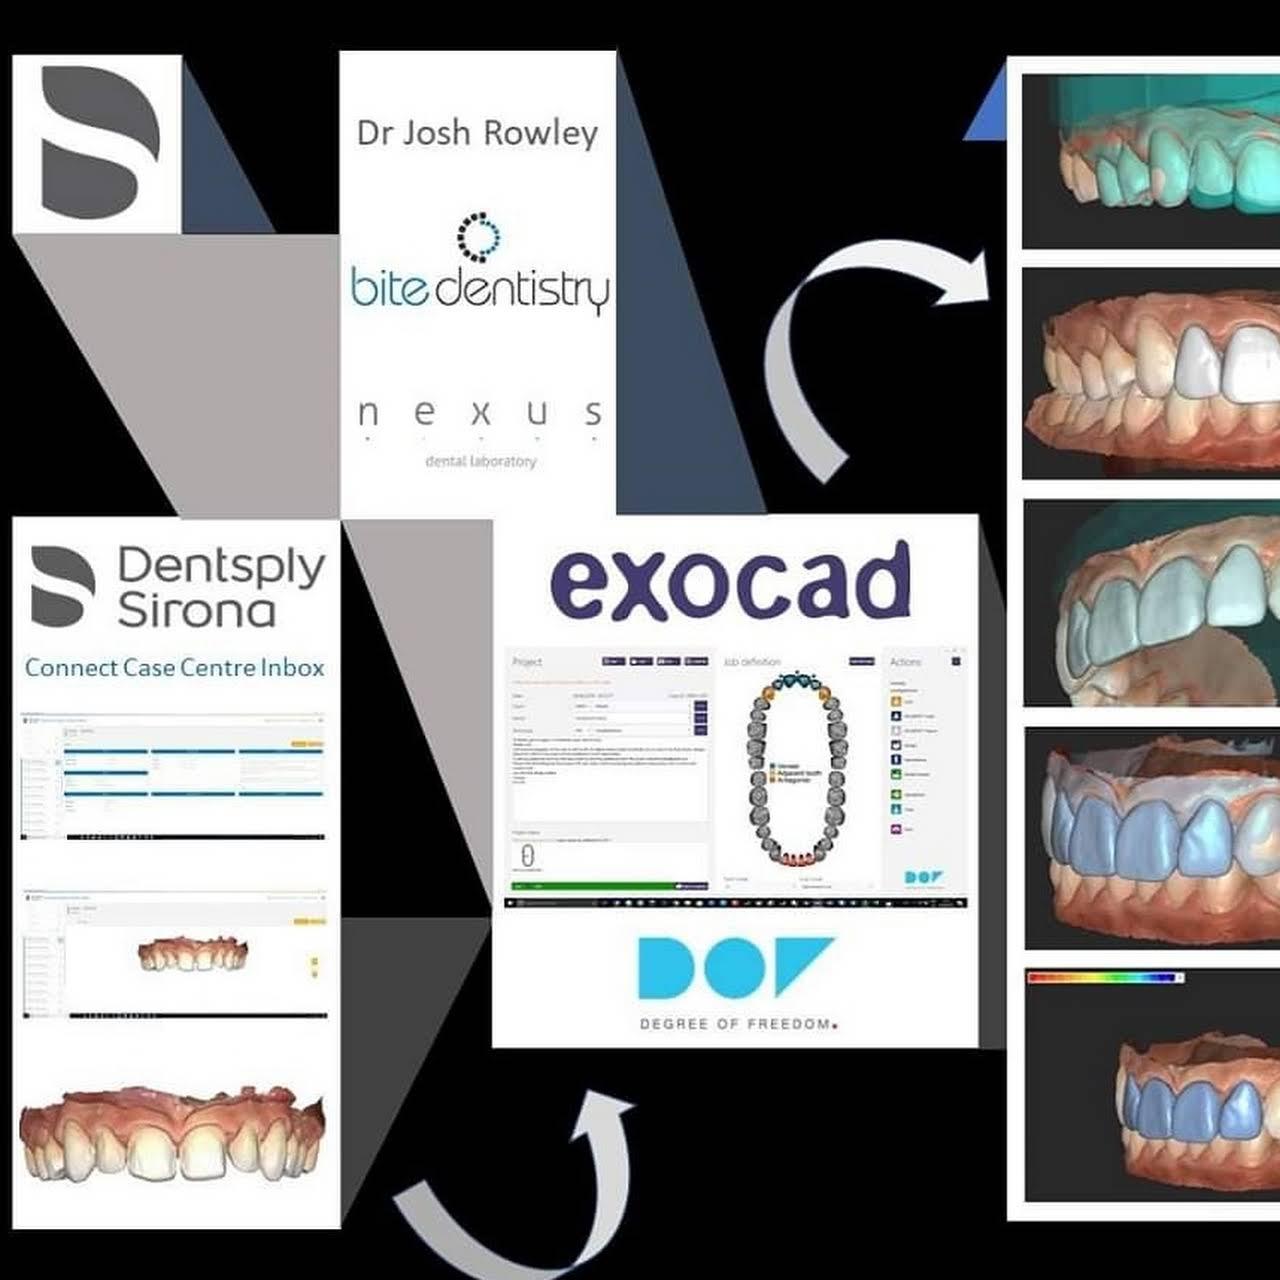 Nexus Dental Laboratory - Dental Laboratory